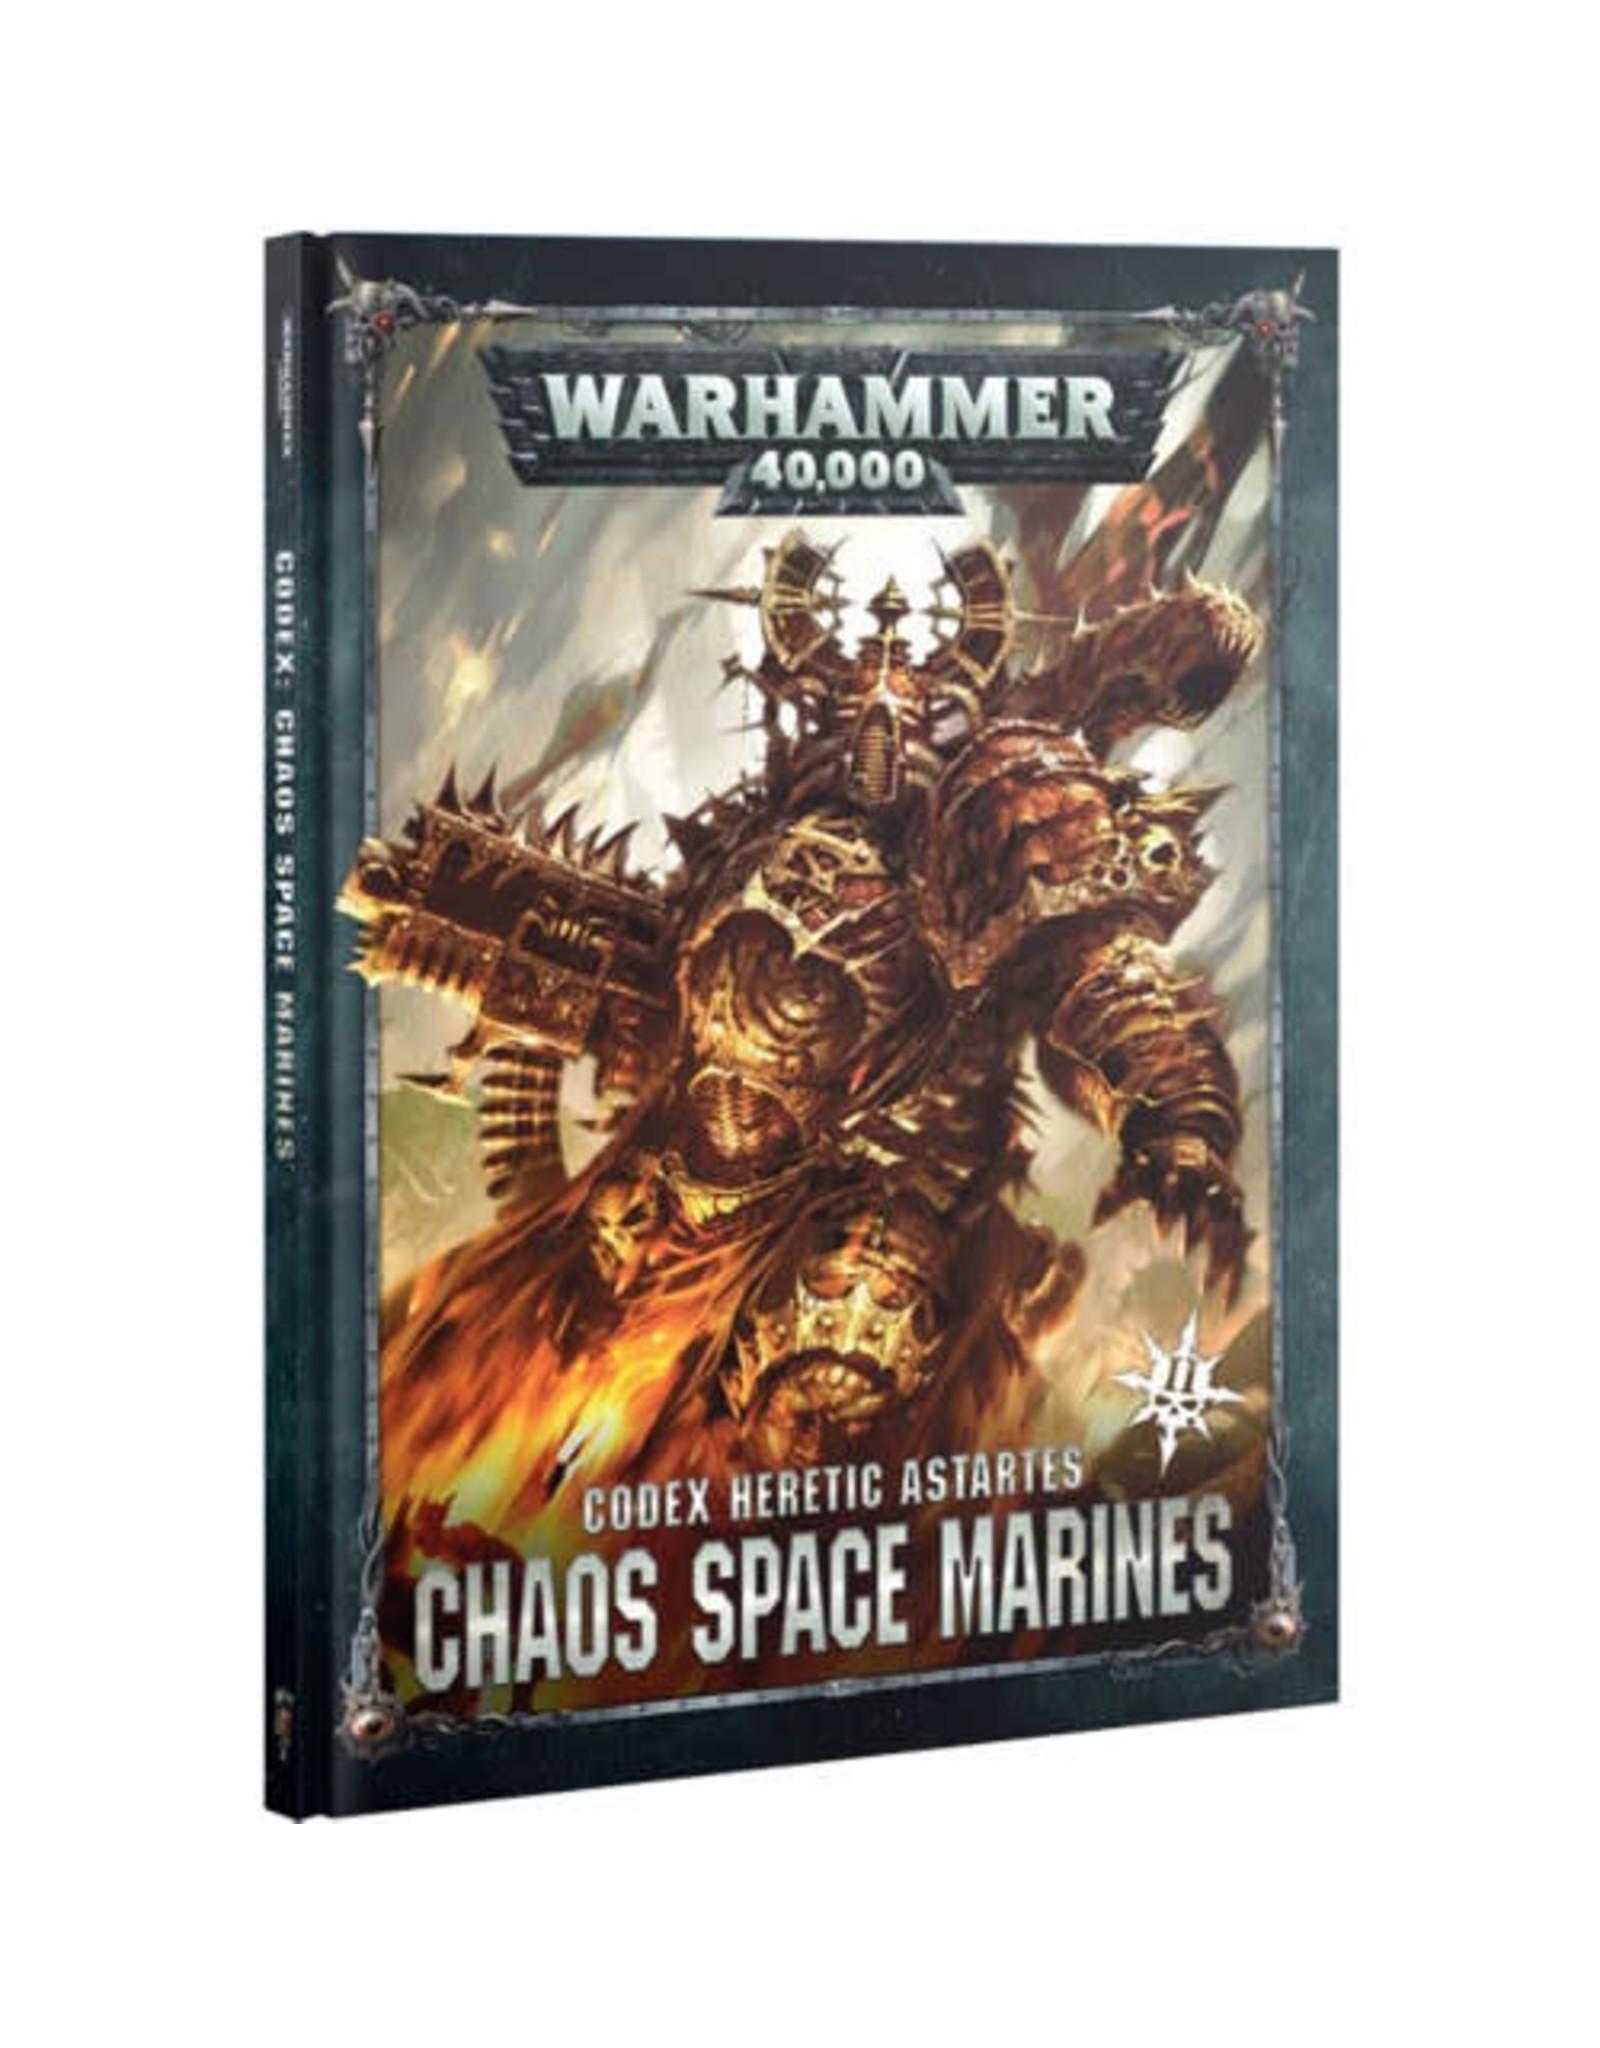 Chaos Space Marines 2 Codex 8th Ed. (40K)